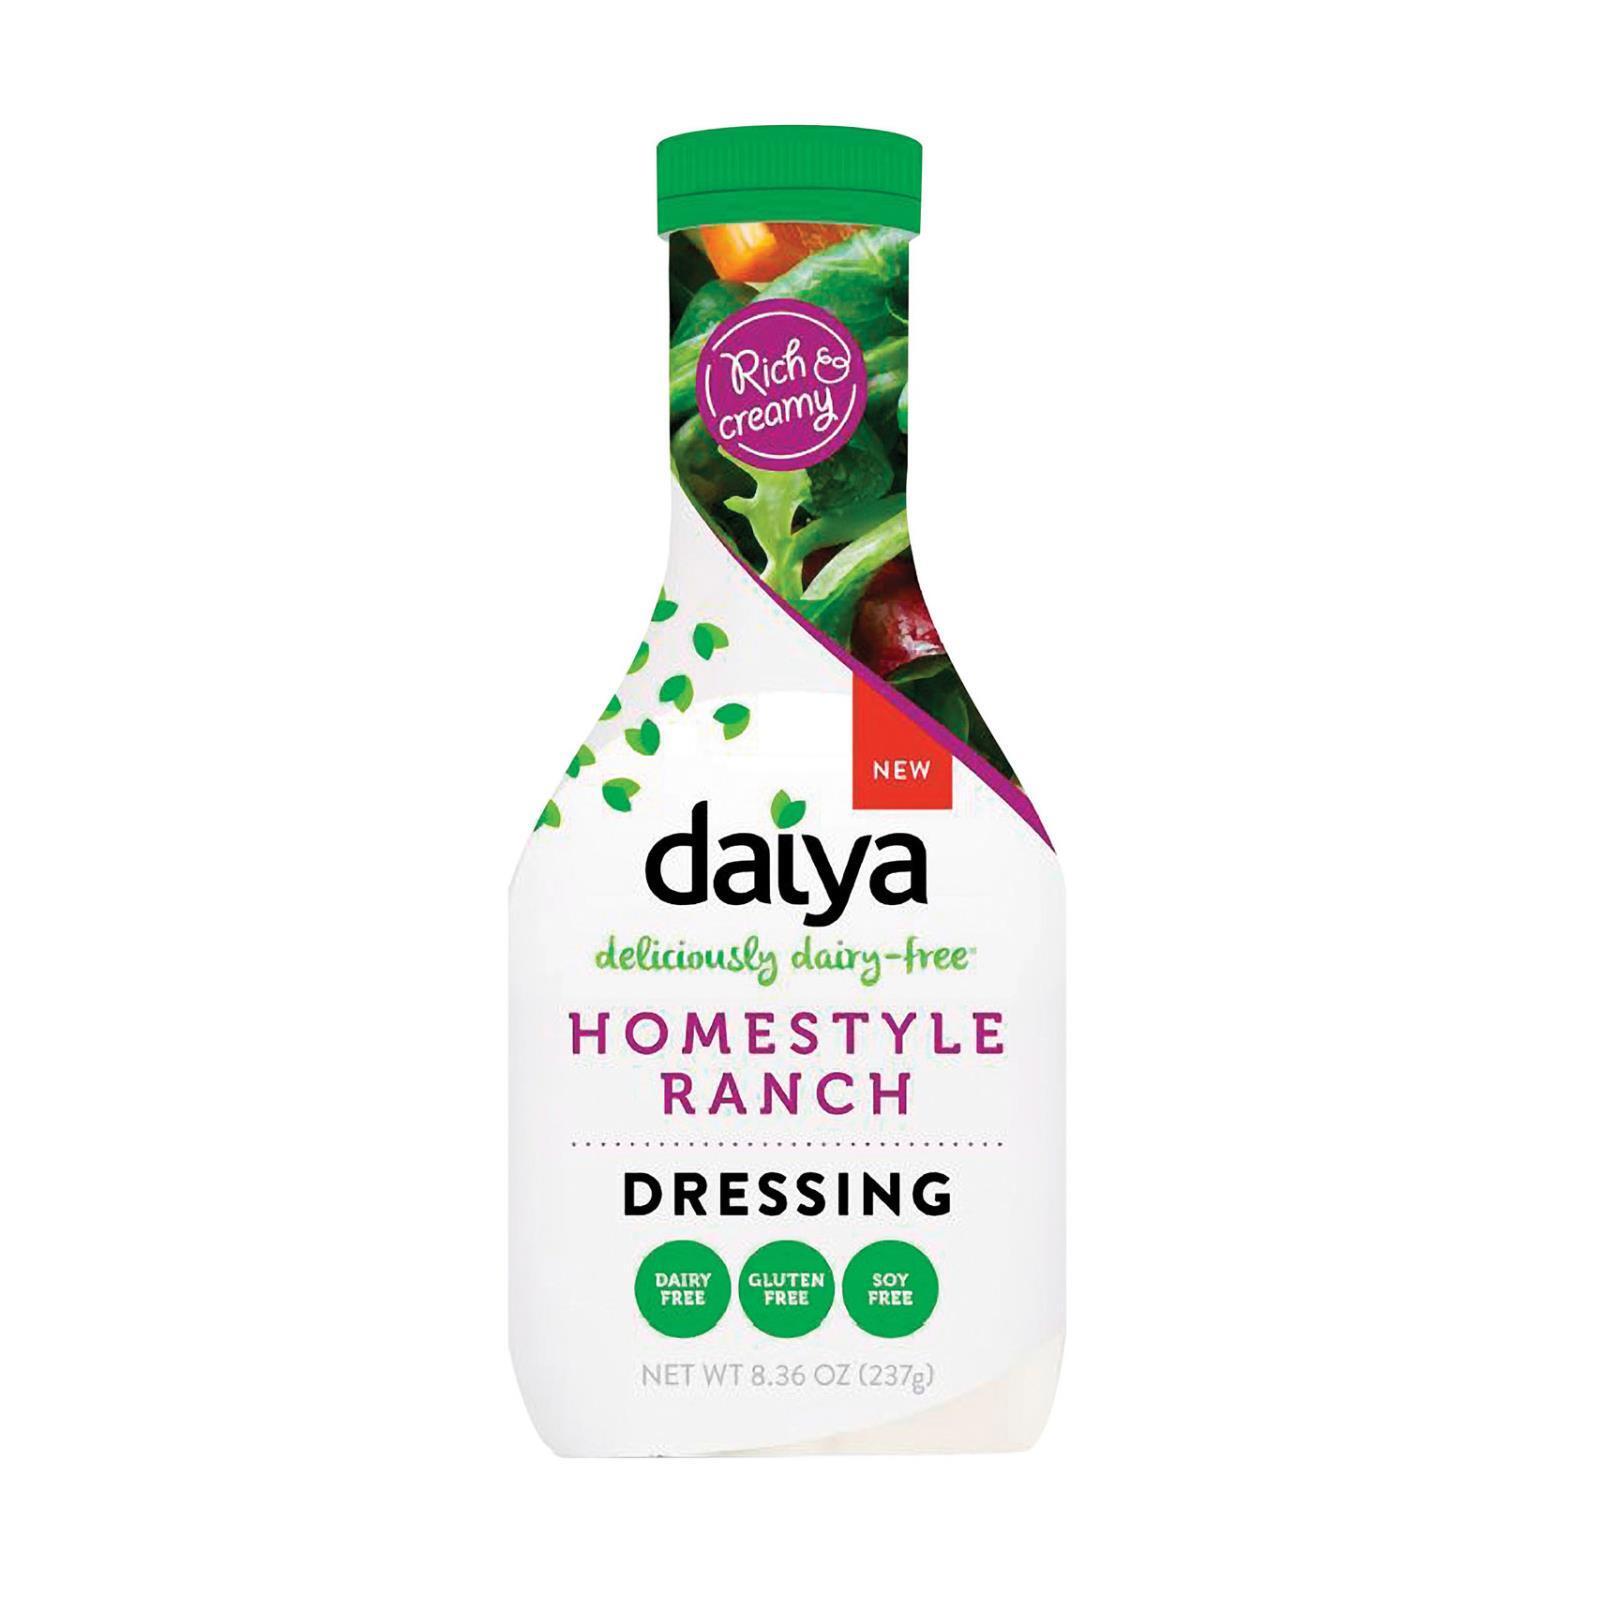 Daiya Foods Homestyle Ranch Dairy - Free Dressing - Case of 6 - 8.36 FL oz.